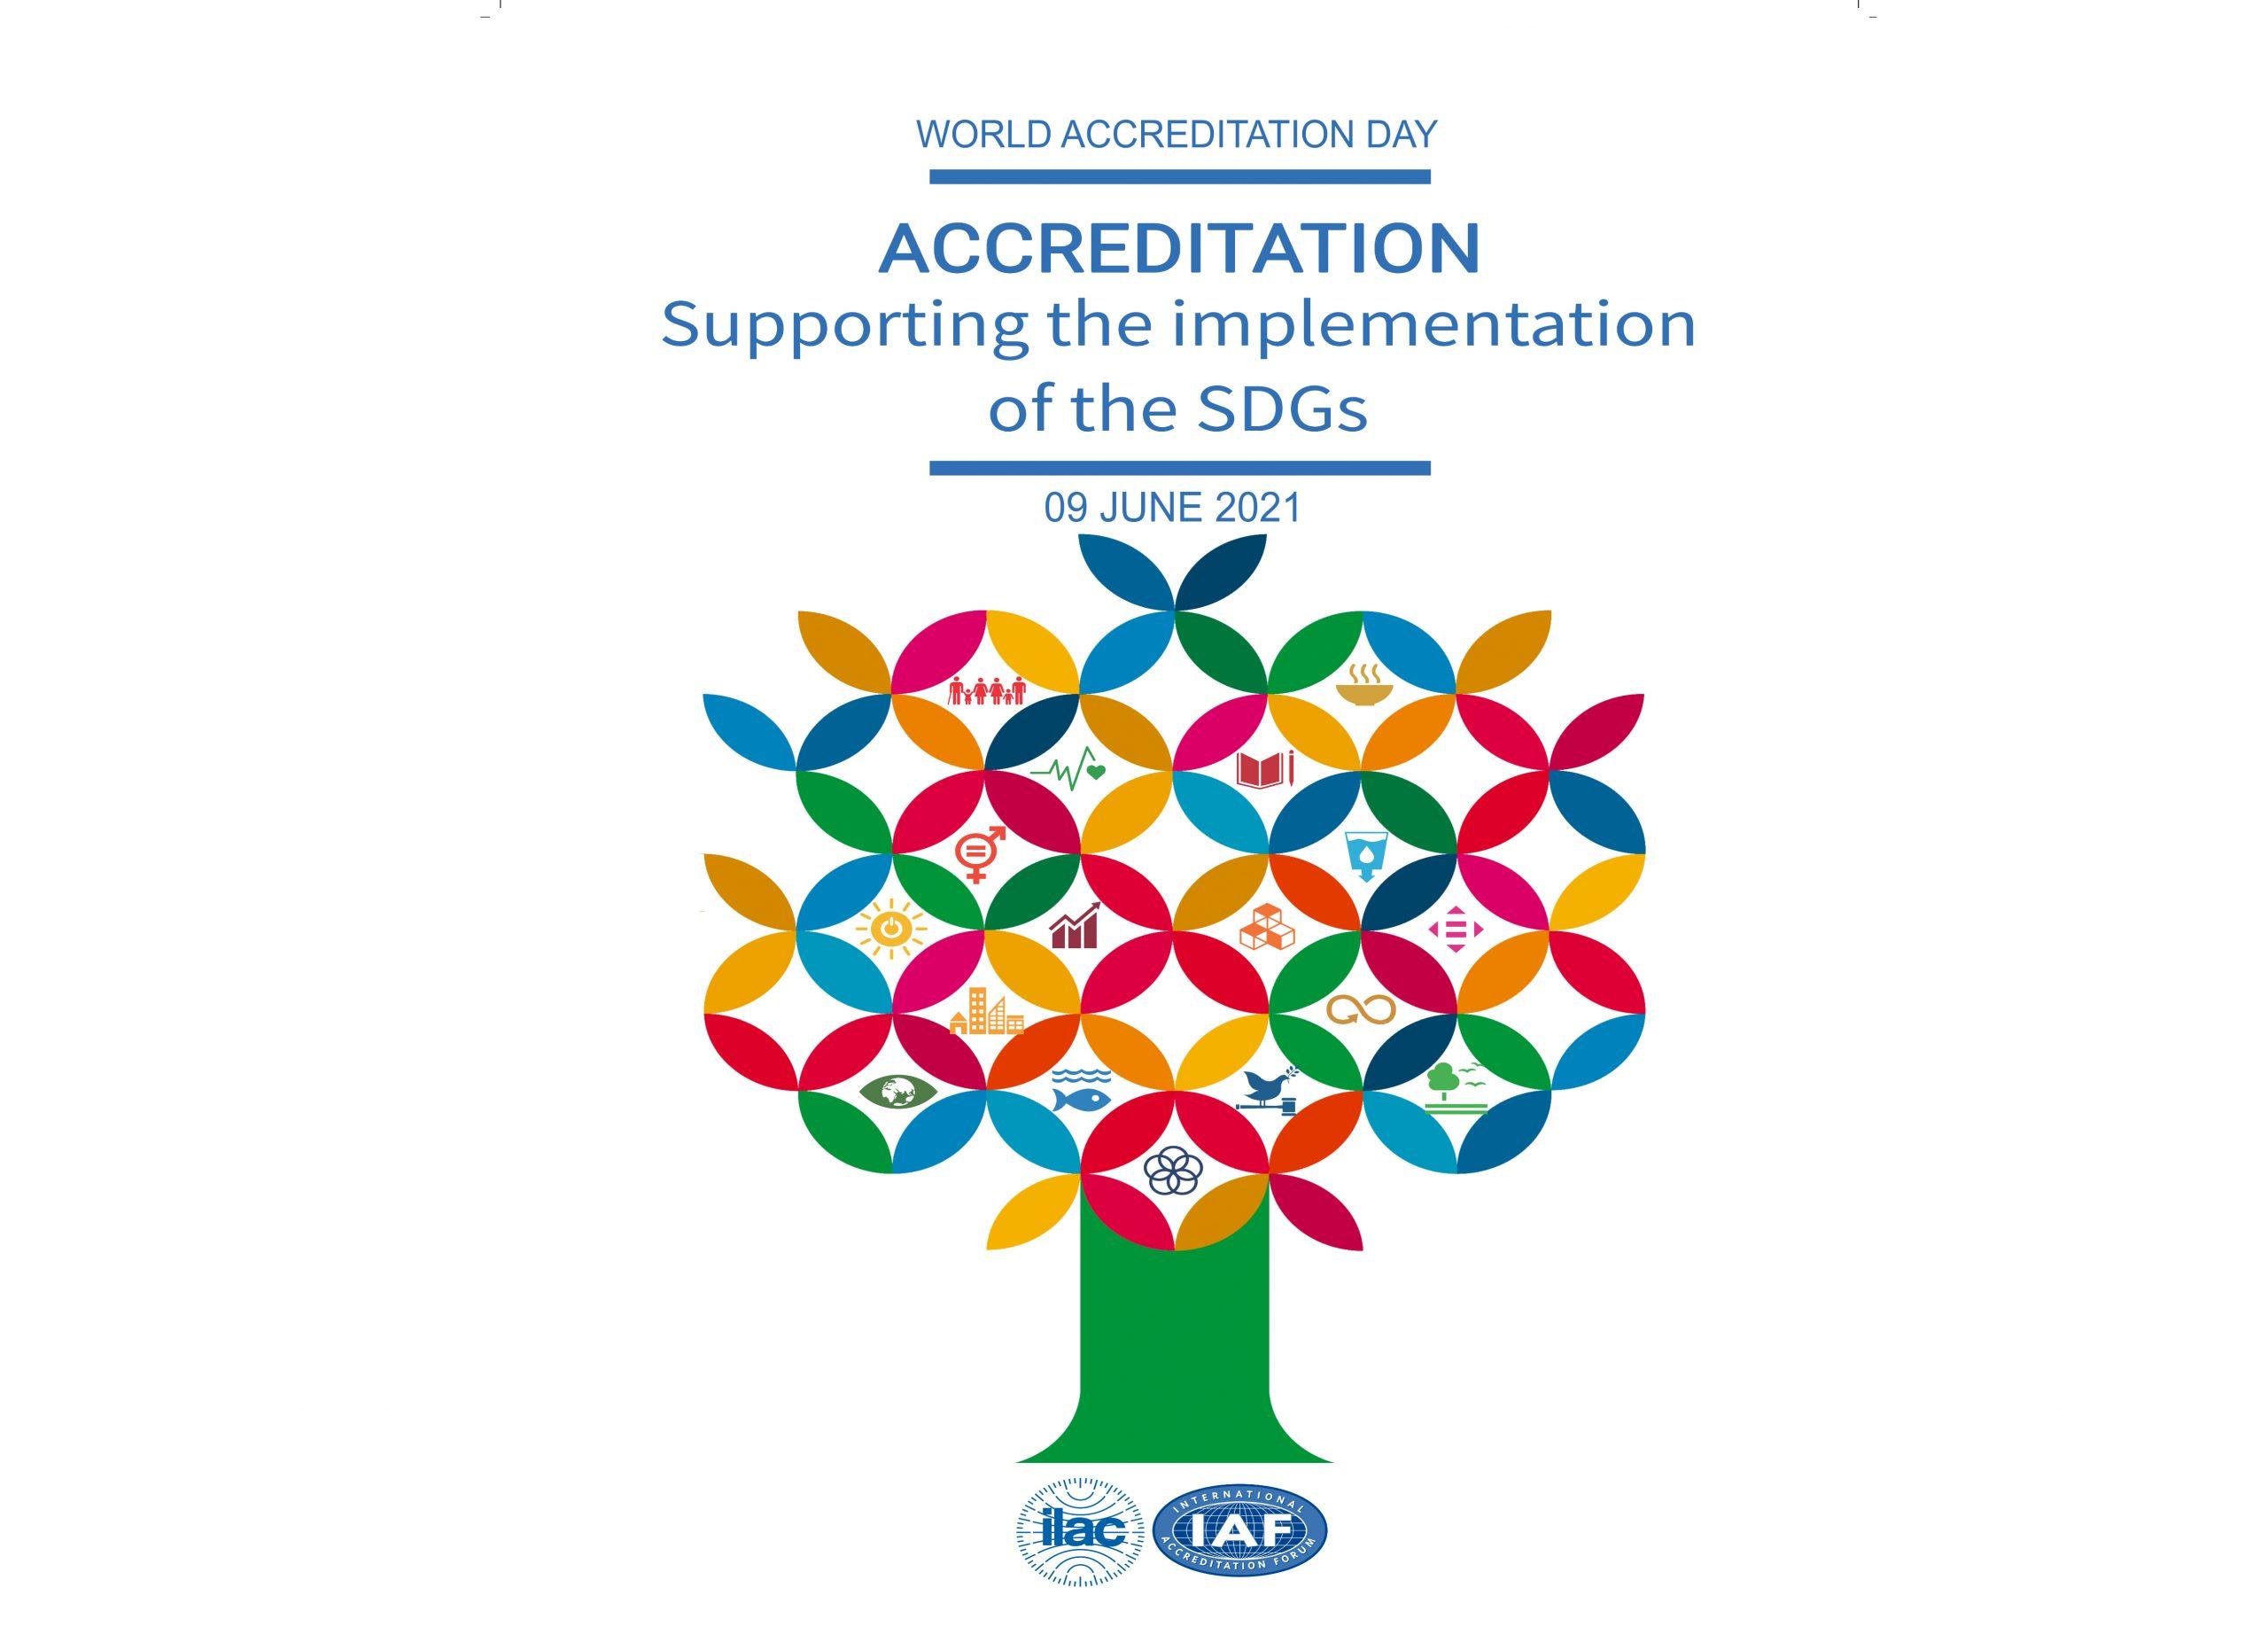 AAA Accreditation Celebrates the World Accreditation Day 2021